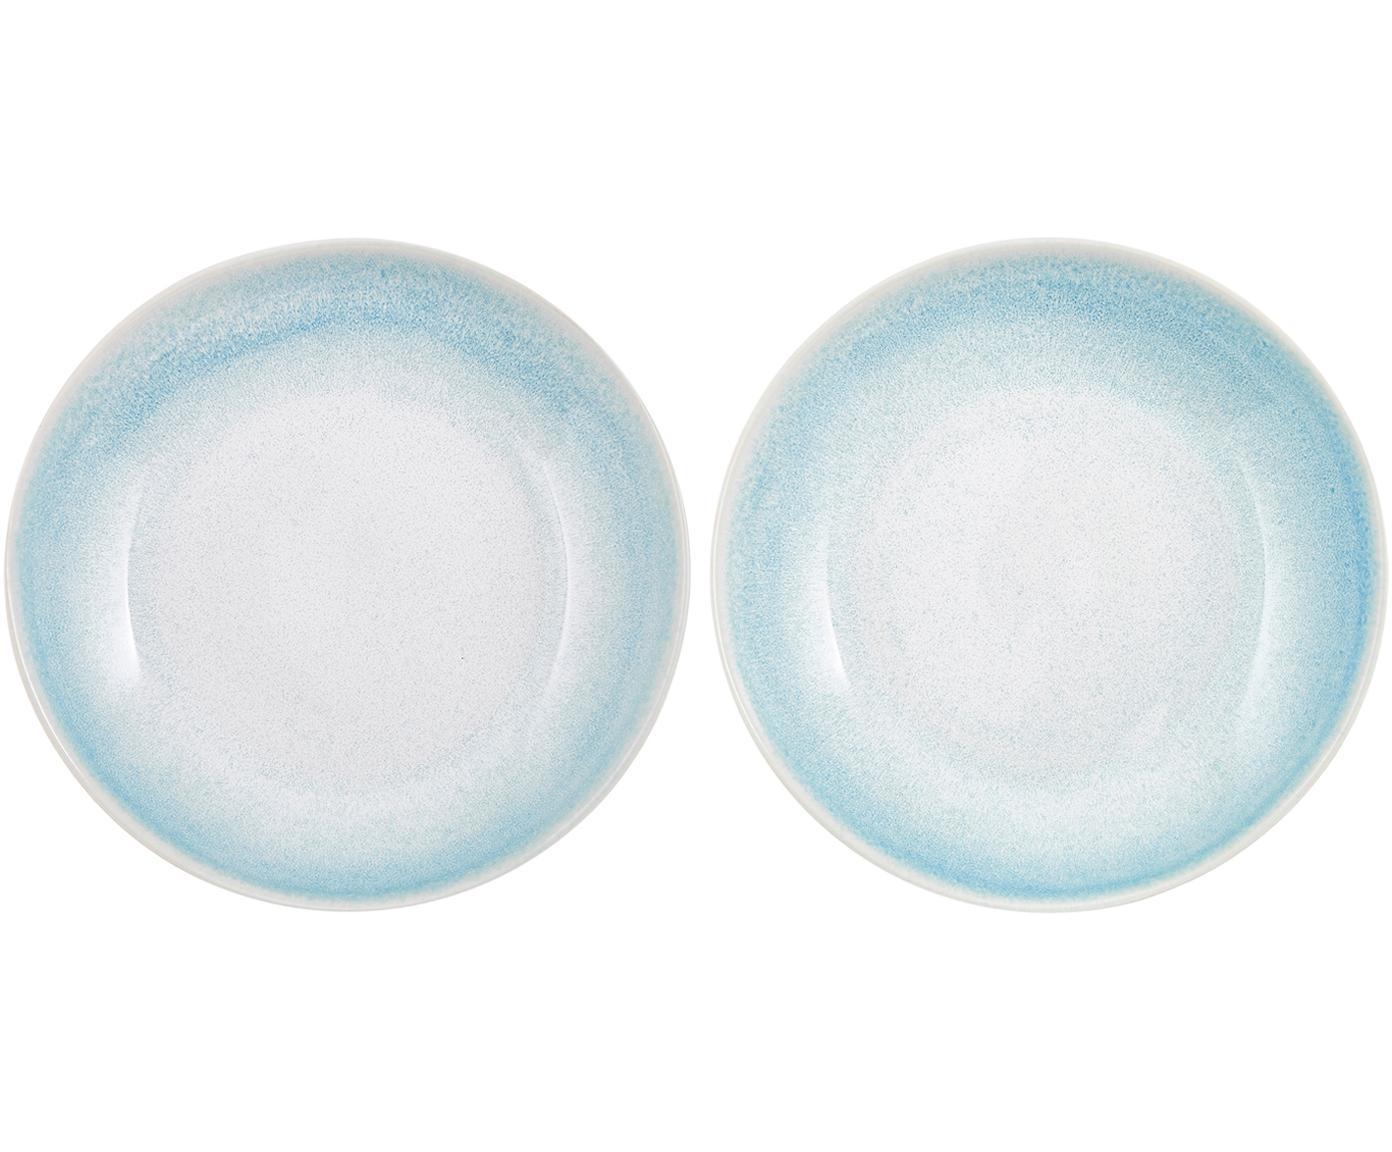 Handgemaakte soepborden Amalia, 2 stuks, Keramiek, Lichtblauw, crèmewit, Ø 20 cm